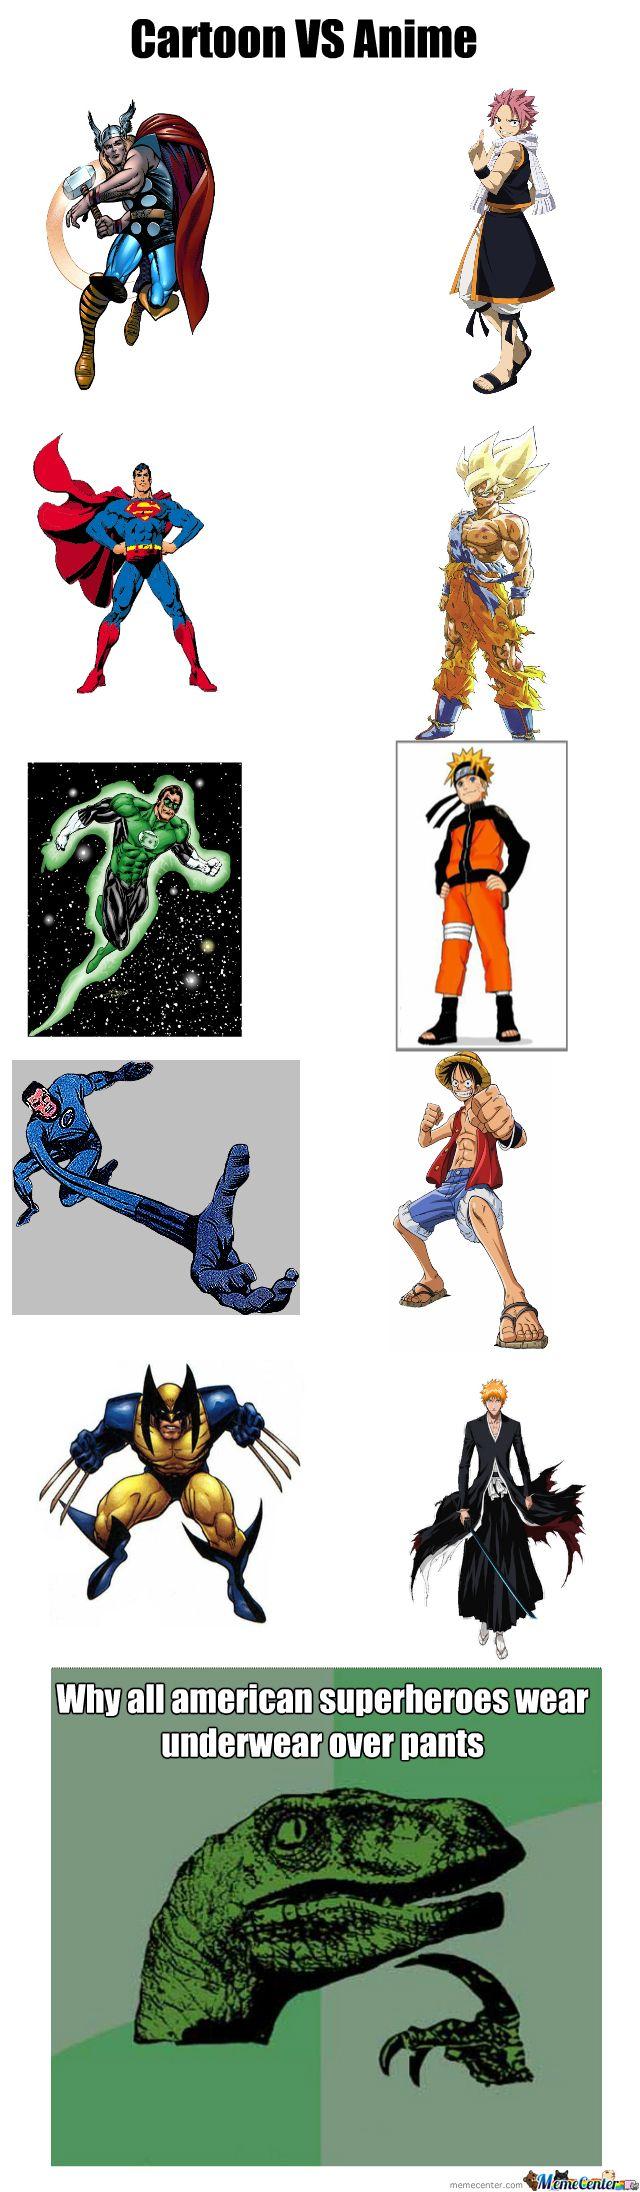 cartoon vs anime Google Search Anime vs cartoon, All